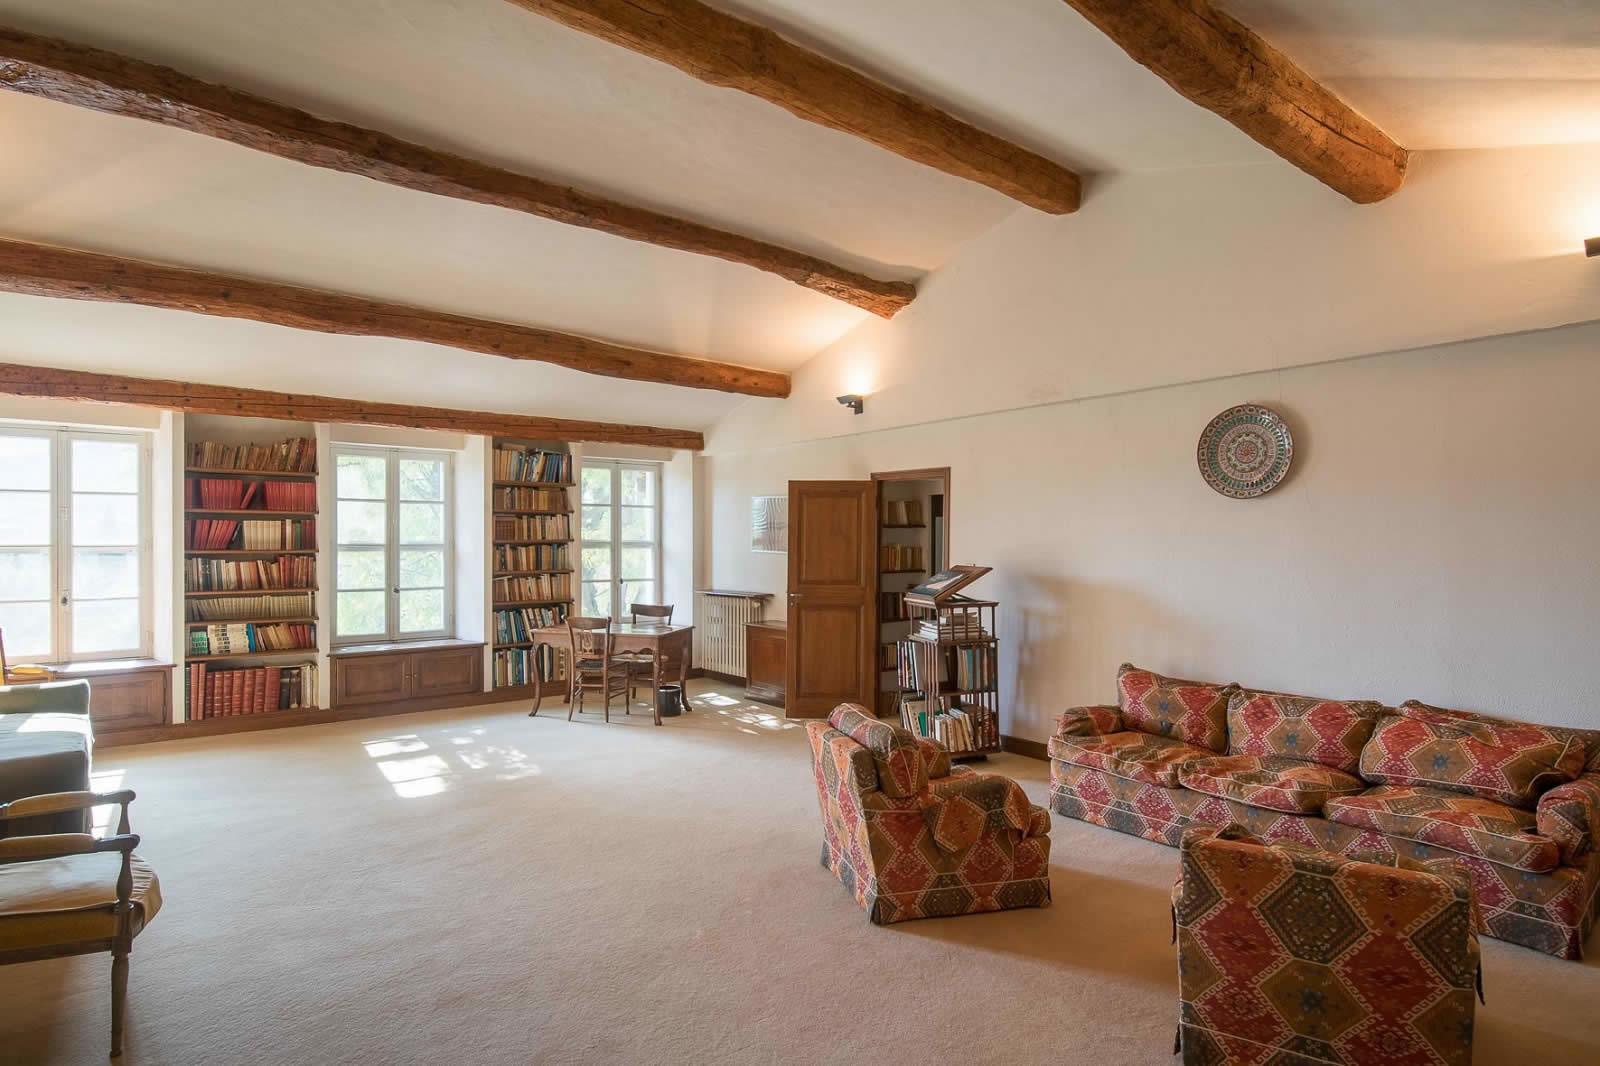 propriete-vaste-lumineuse-4-hectares-16eme-siecle-charme-provencal-a-vendre-auribeau-sur-siagne